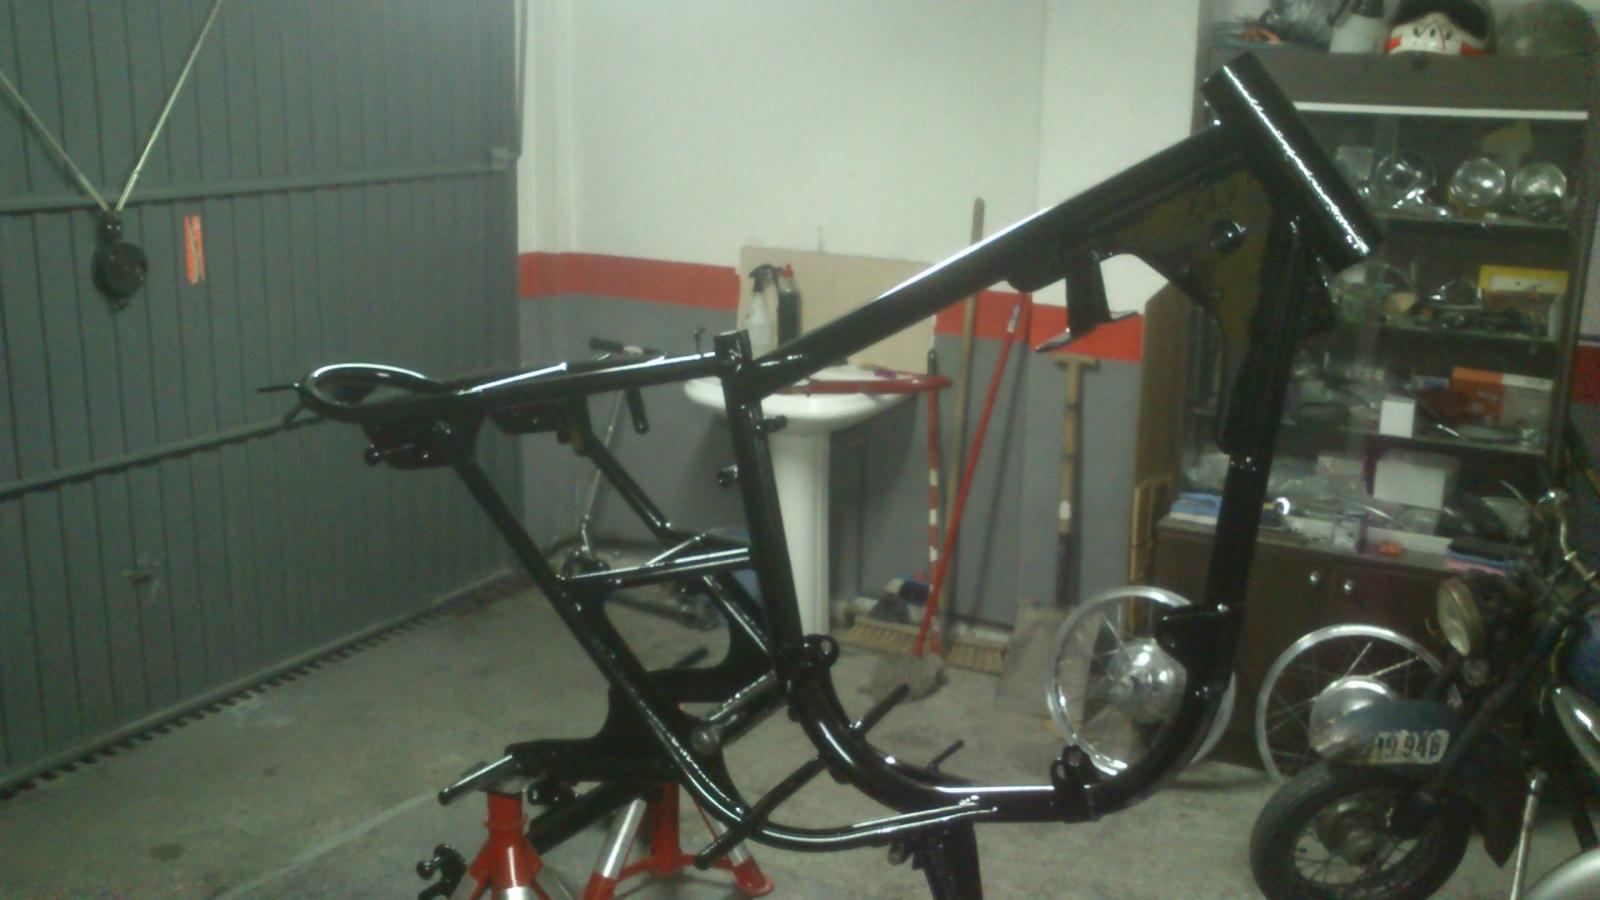 De vuelta a la carretera: Bultaco Tralla 102 2eej4hz